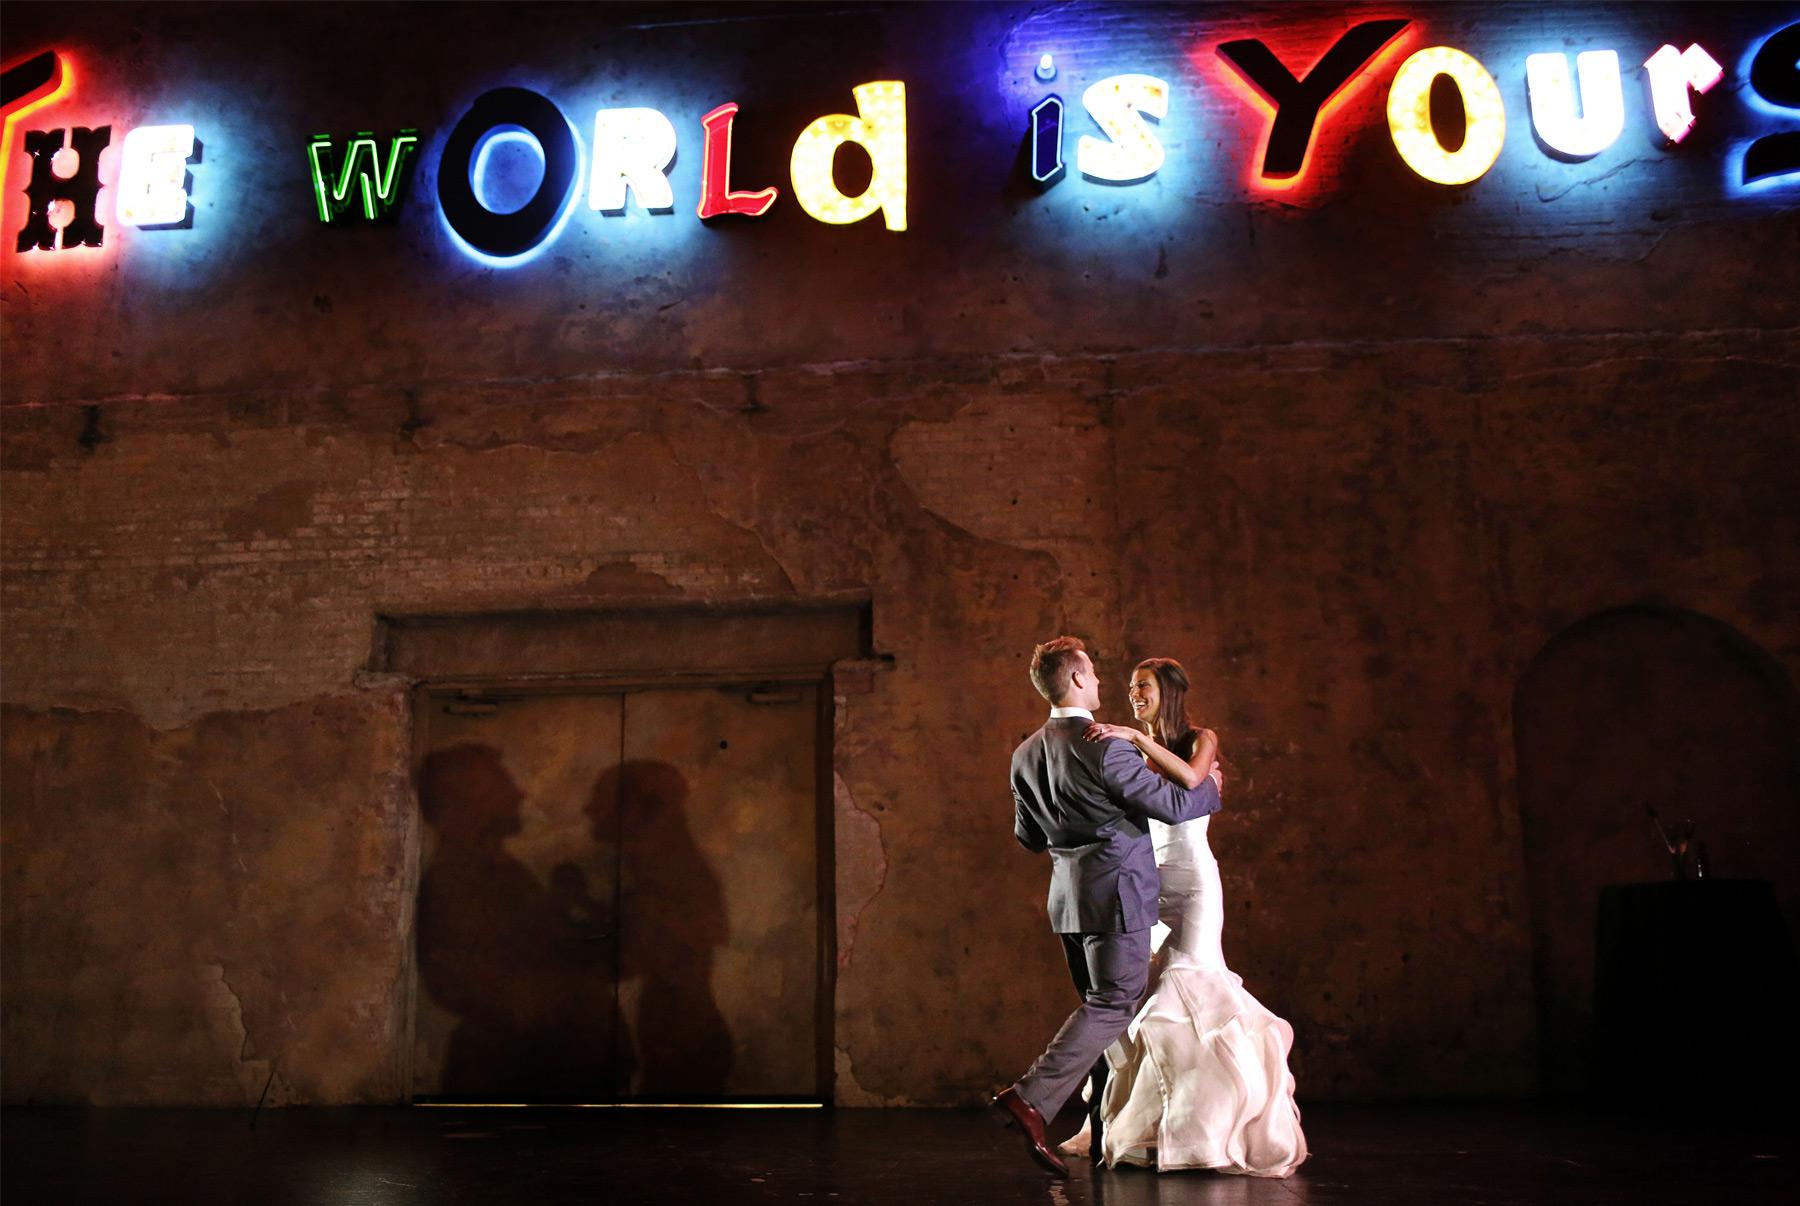 21-Minneapolis-Minnesota-Wedding-Photography-by-Vick-Photography-Aria-Reception-First-Dance-Katie-&-Joe.jpg